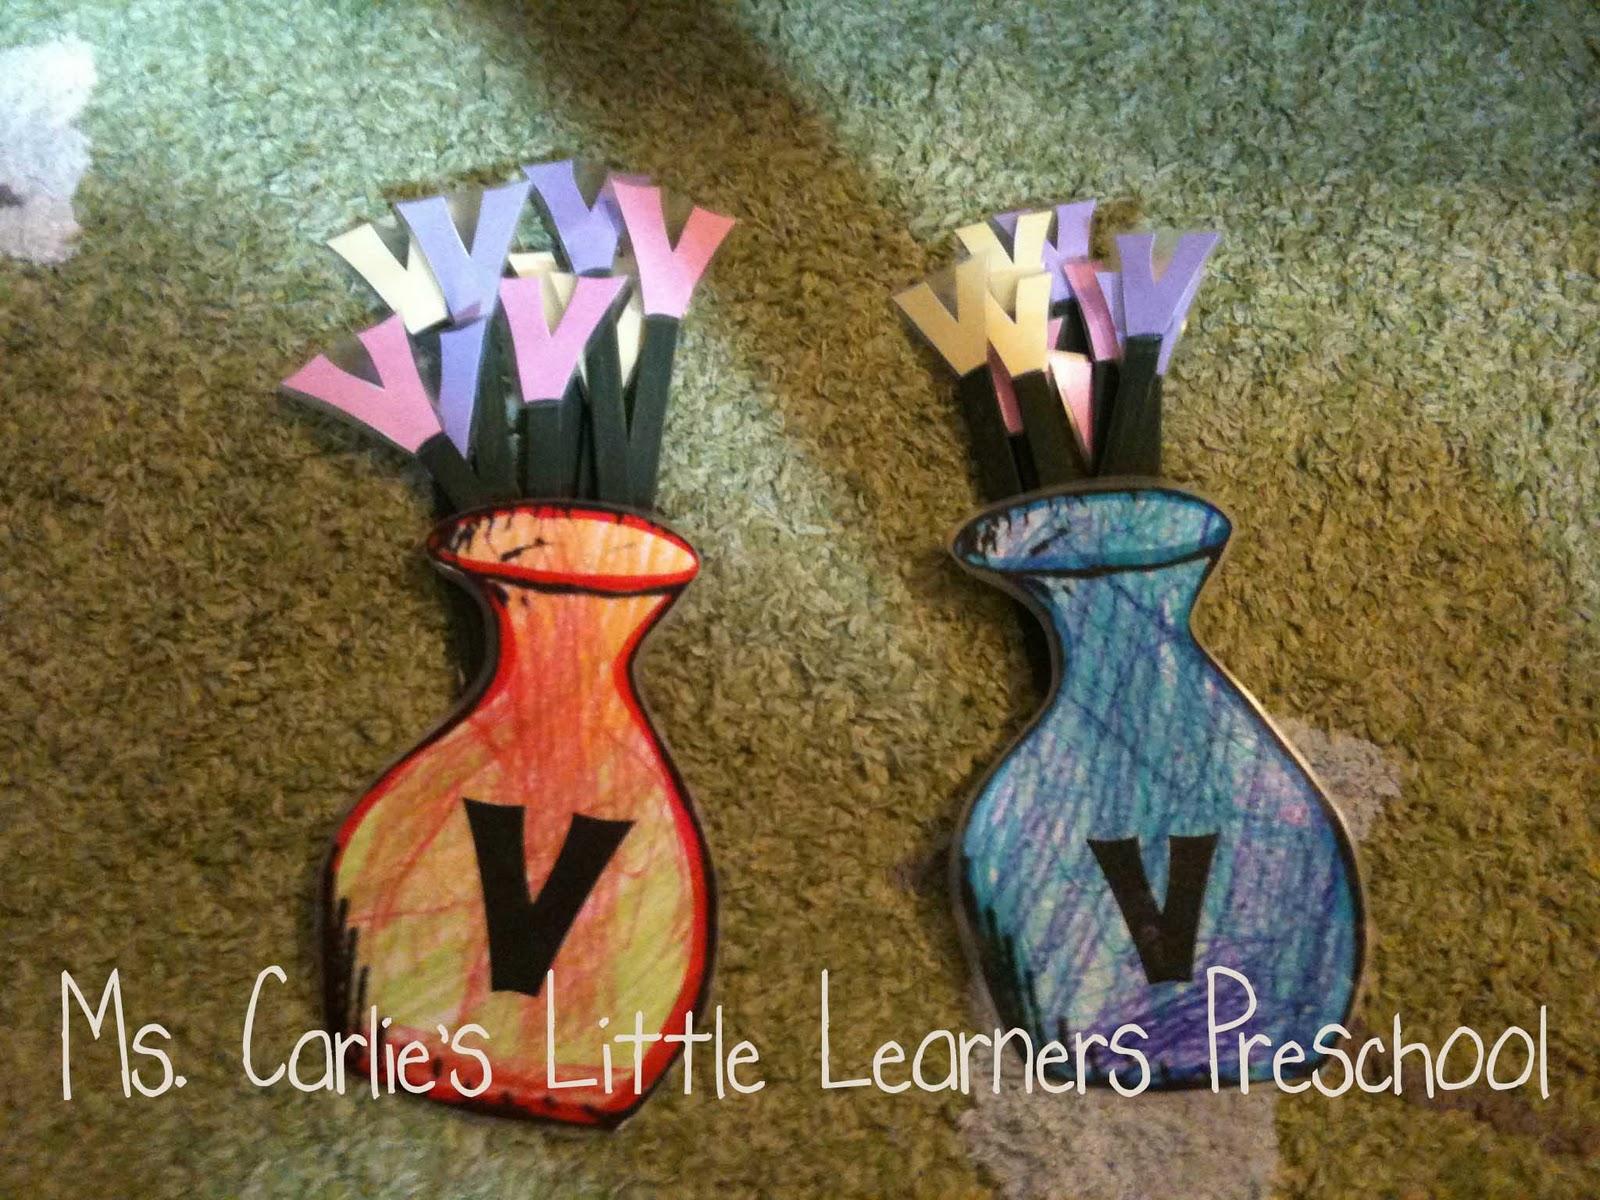 Ms Carlie S Little Learners Preschool Letter V Games Amp Activities